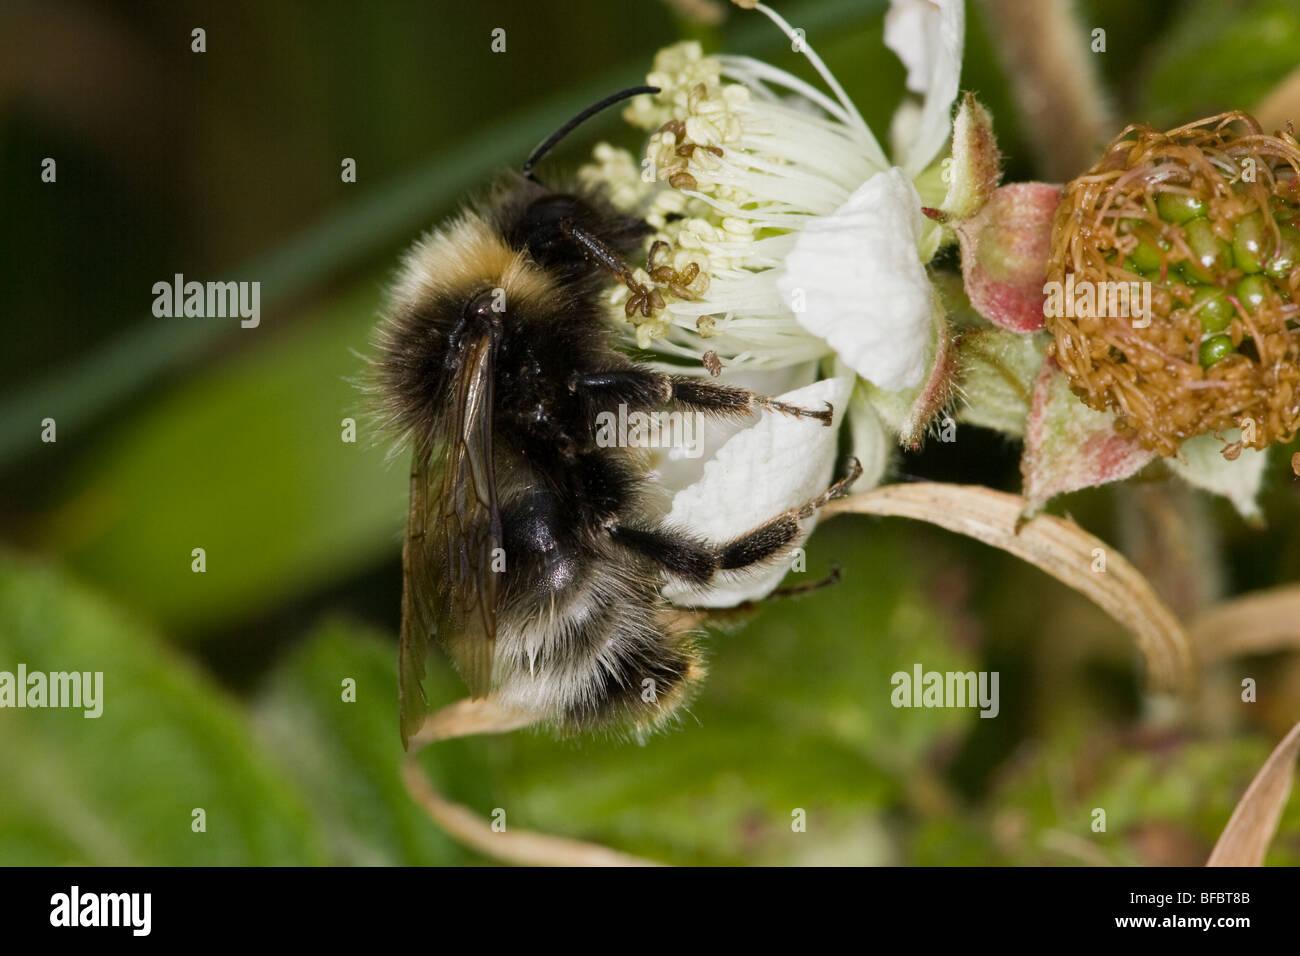 Forest Cuckoo Bumblebee, Bombus sylvestris, on Bramble flower - Stock Image